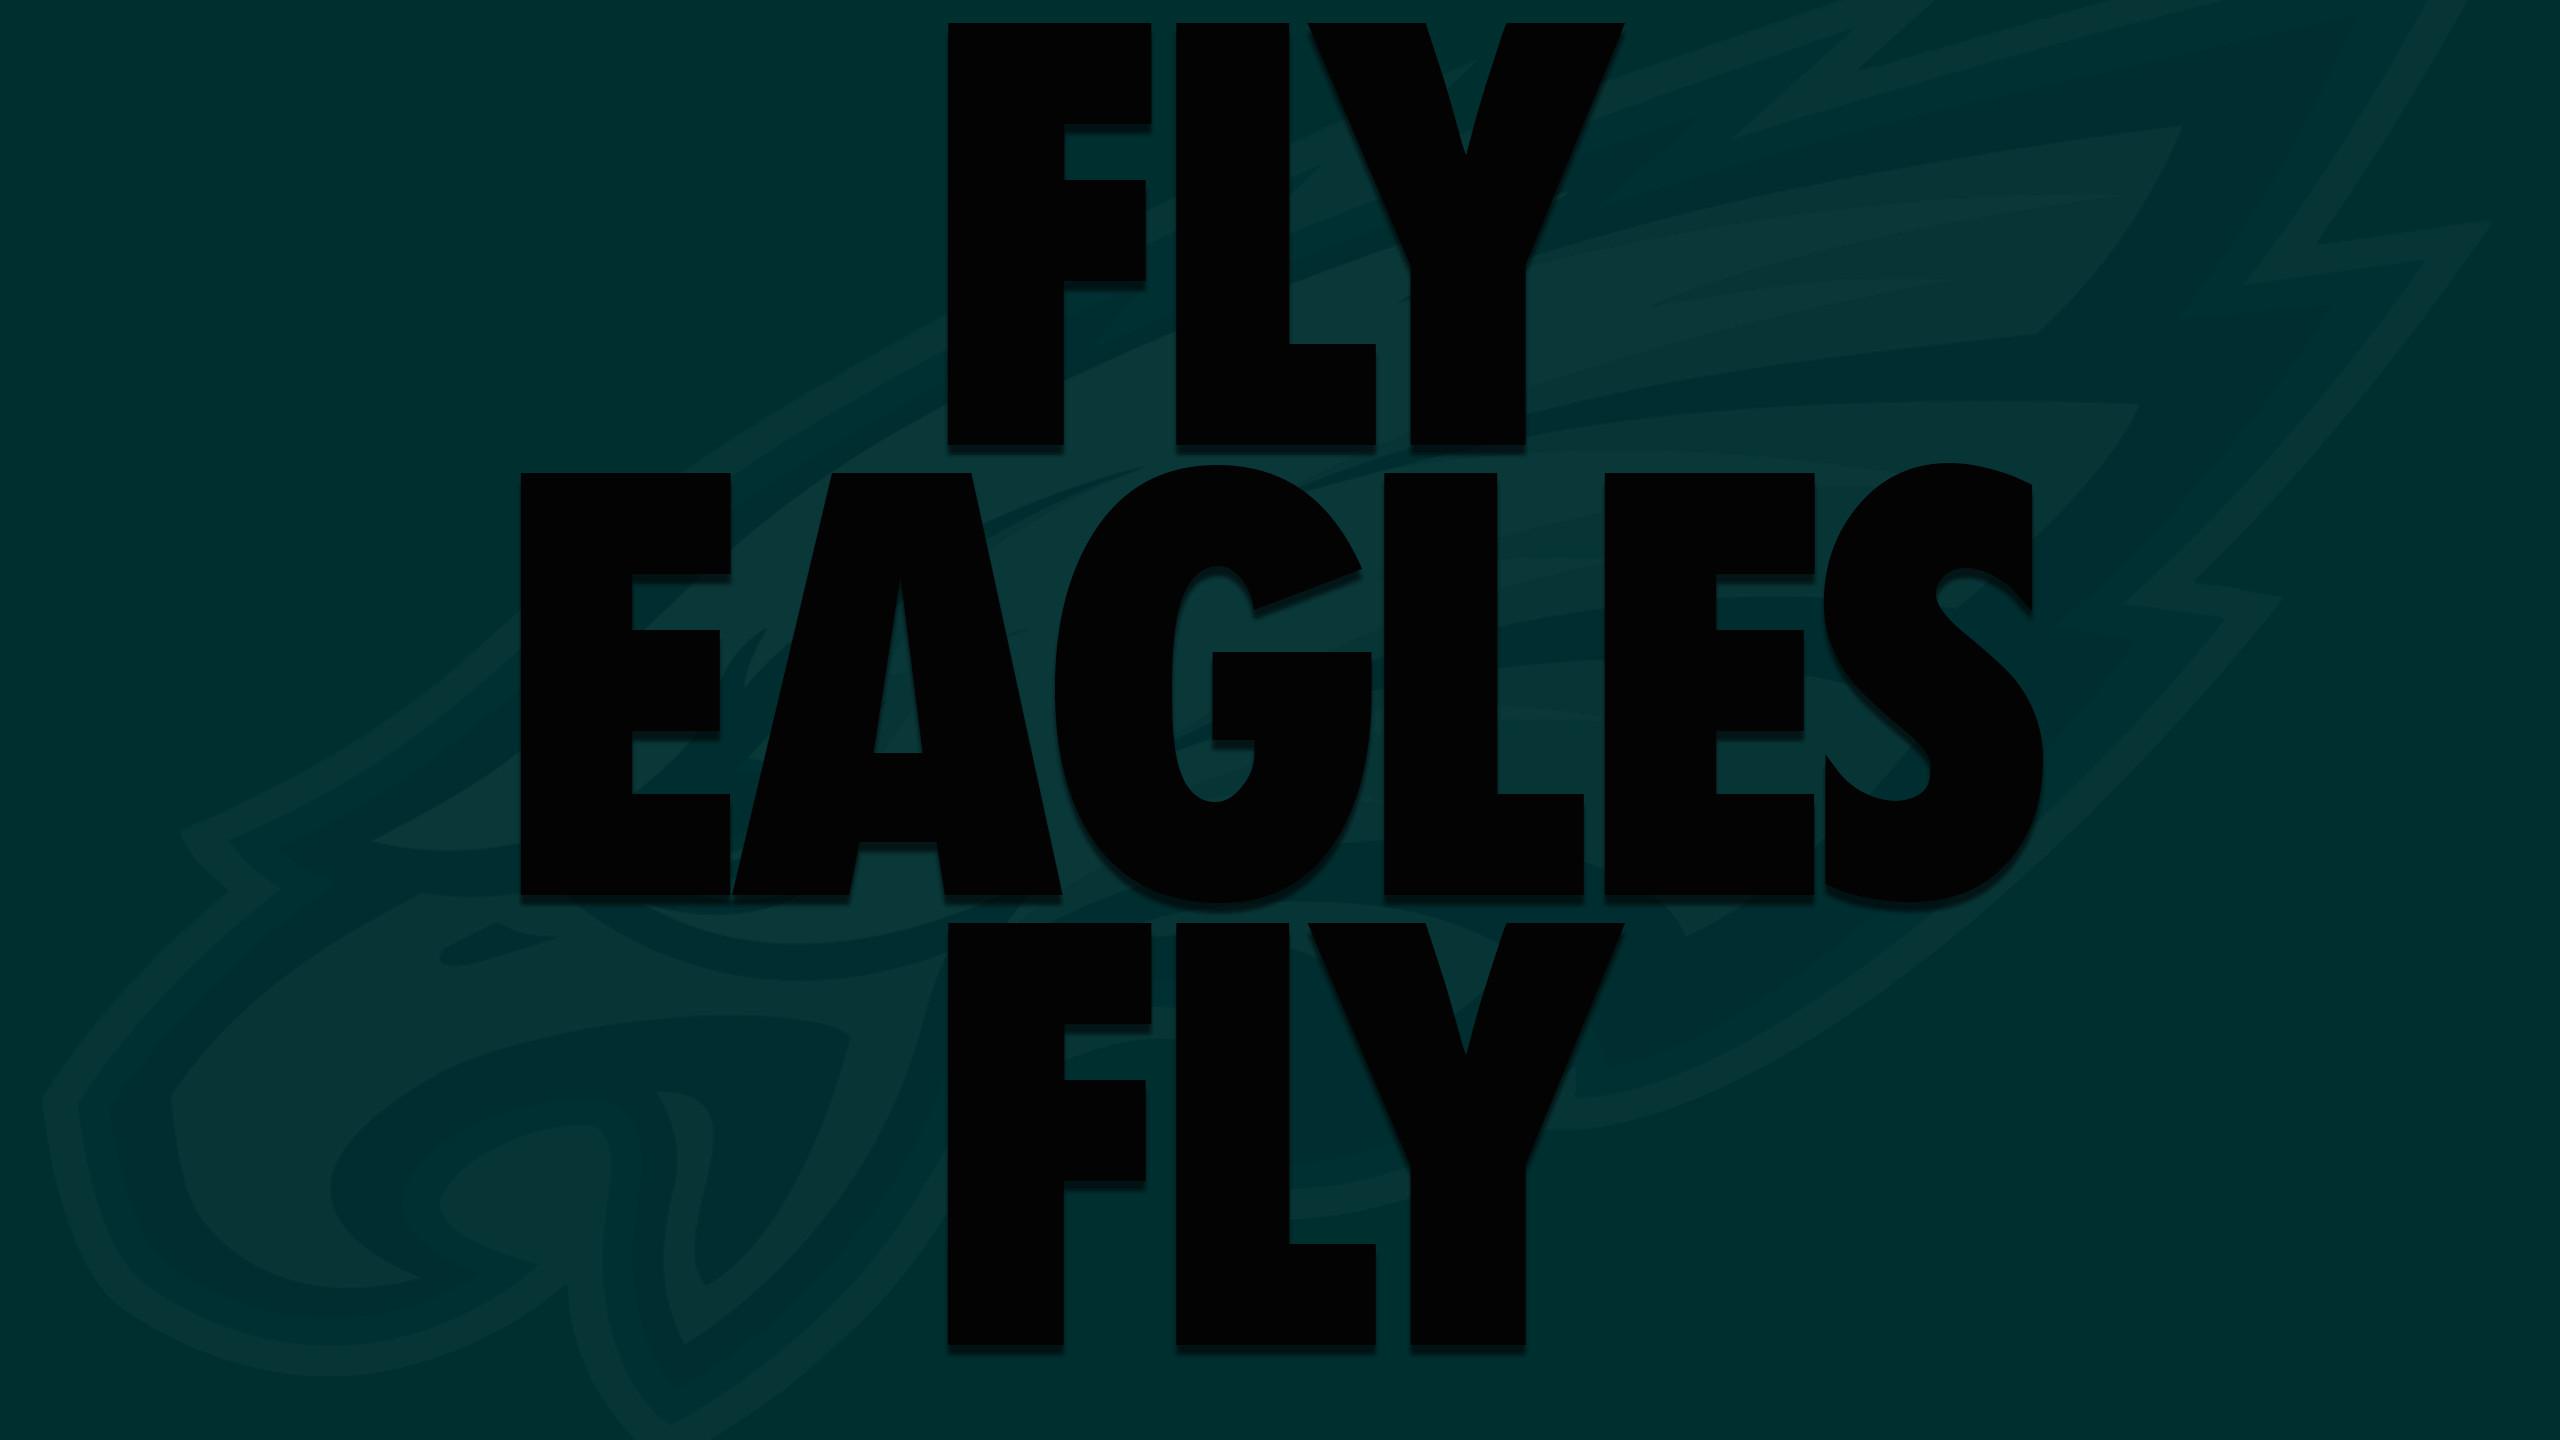 Philadelphia Eagles HD Wallpaper (76+ Images